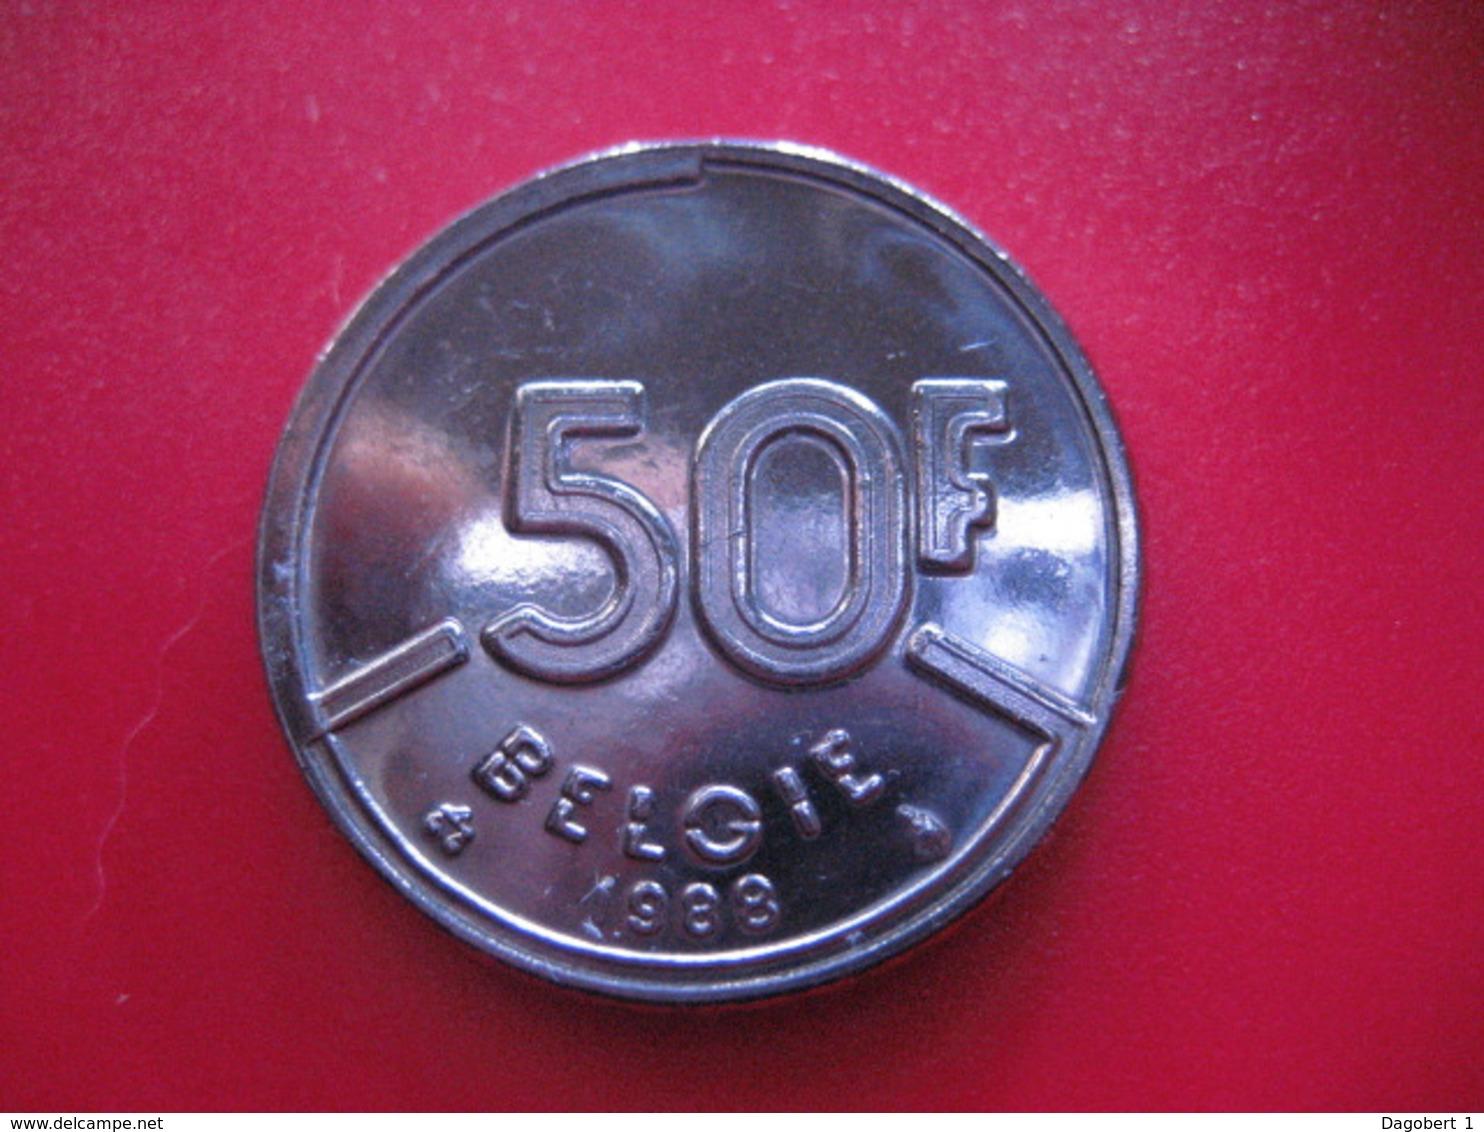 50 Francs 1988 Belgie - Belgium - 1951-1993: Baudouin I